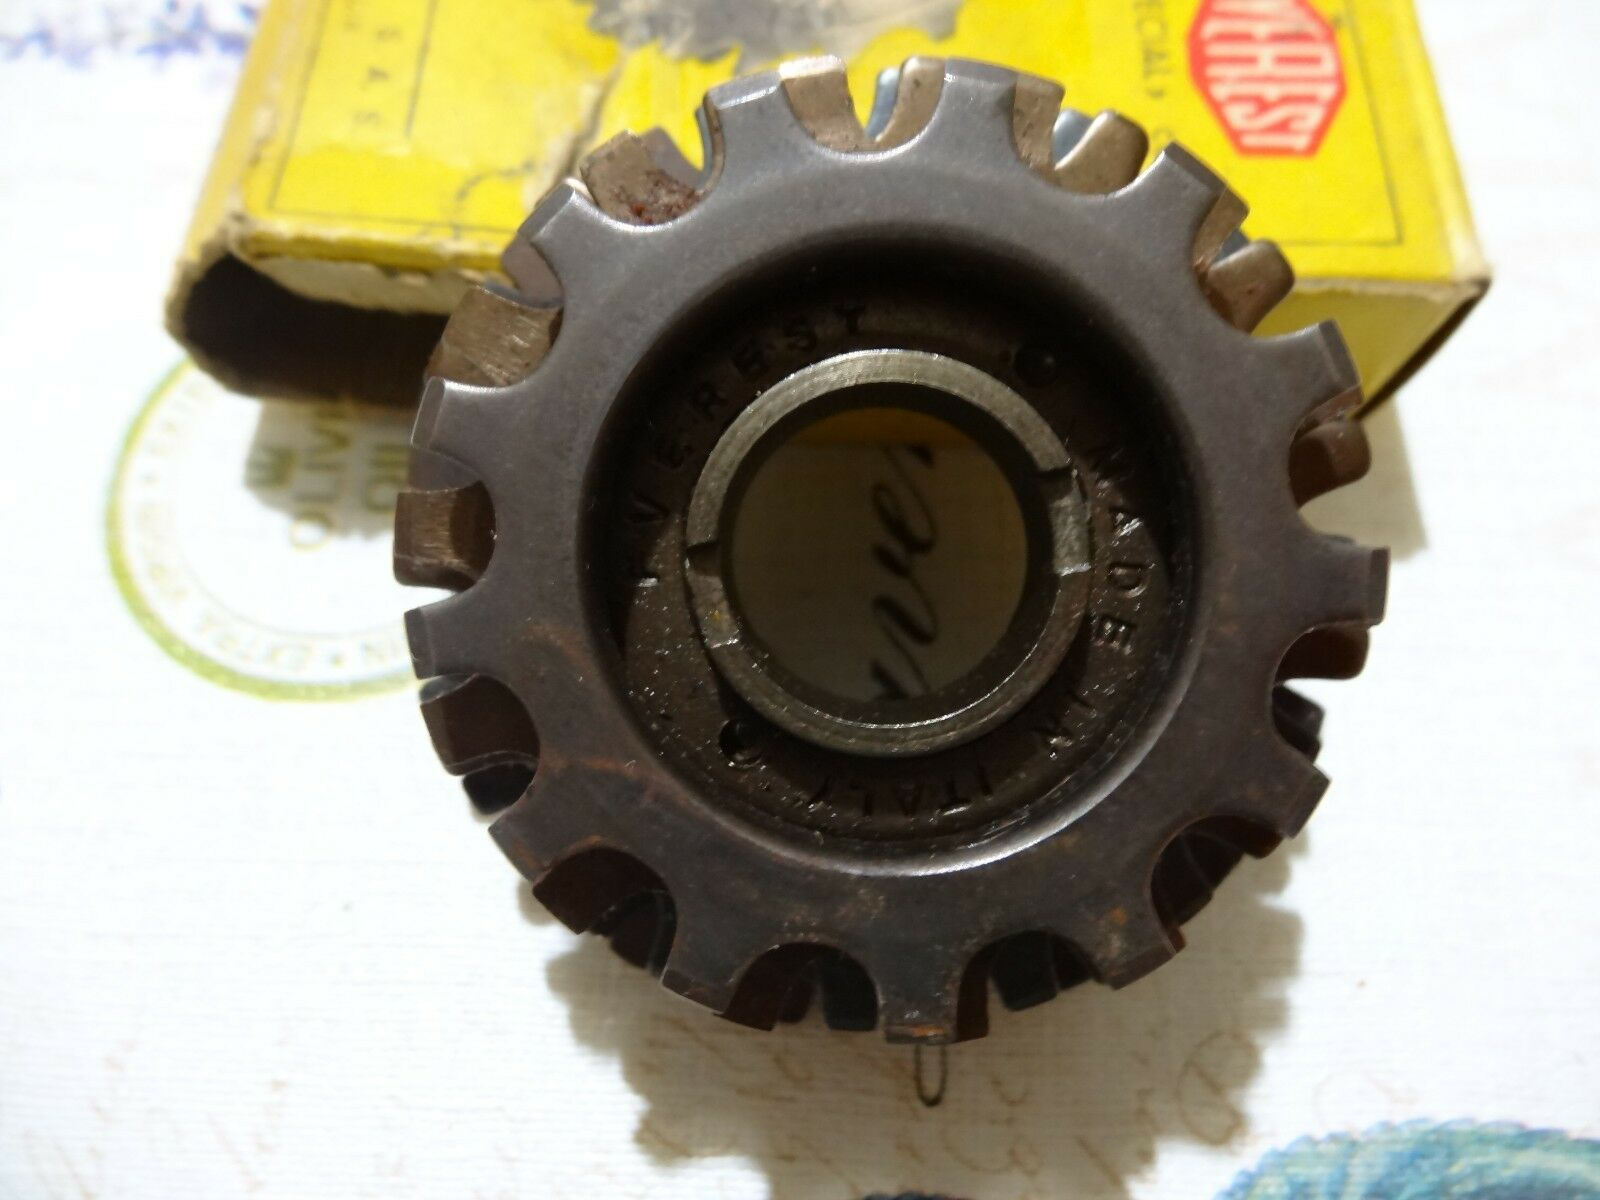 NIB  Everest freewheel,cassette 6 speed 13 14 15 16 17 18 new in  original box